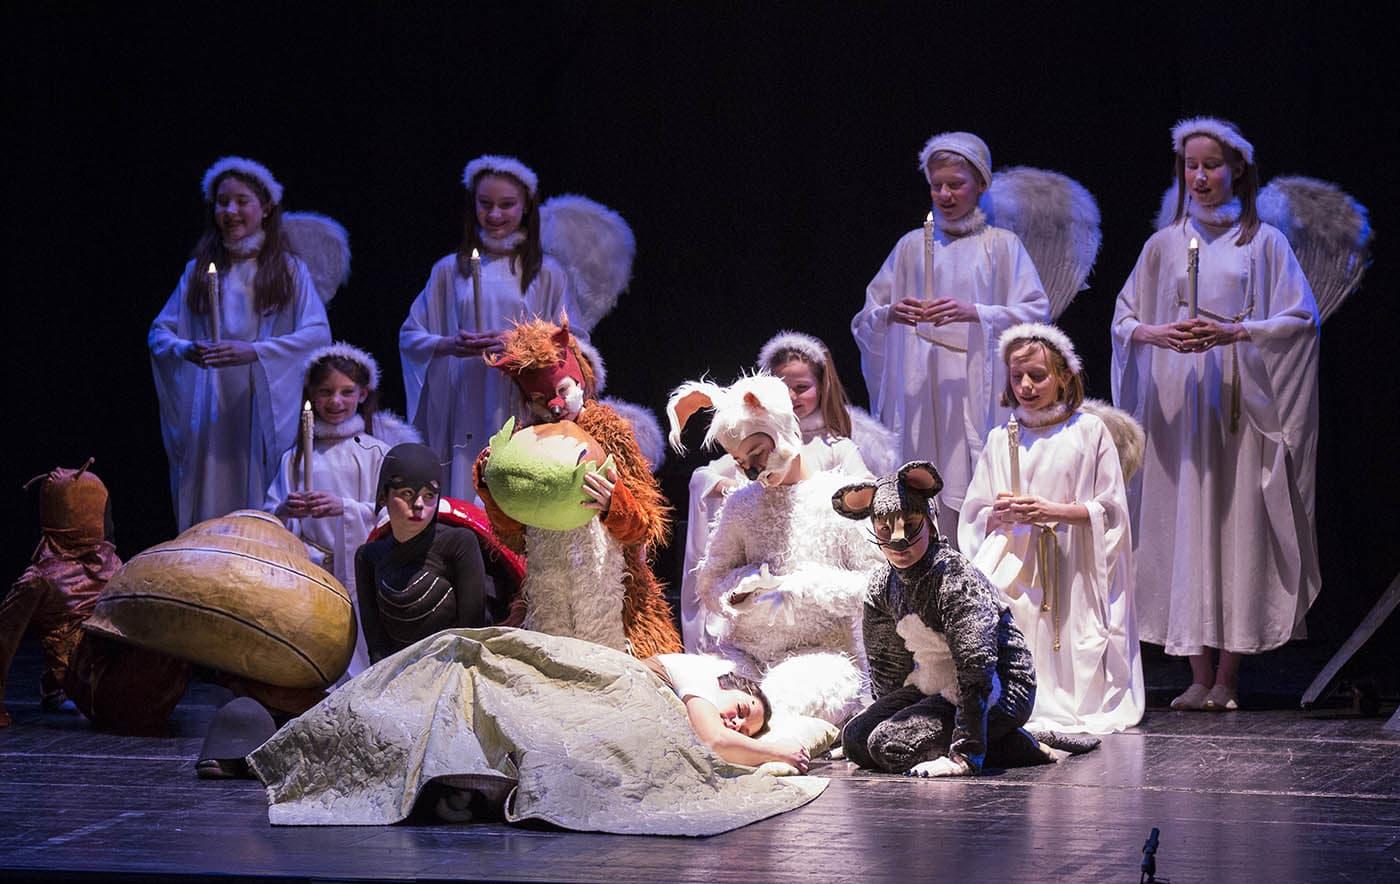 Haensel und Gretel Theater // HIMBEER